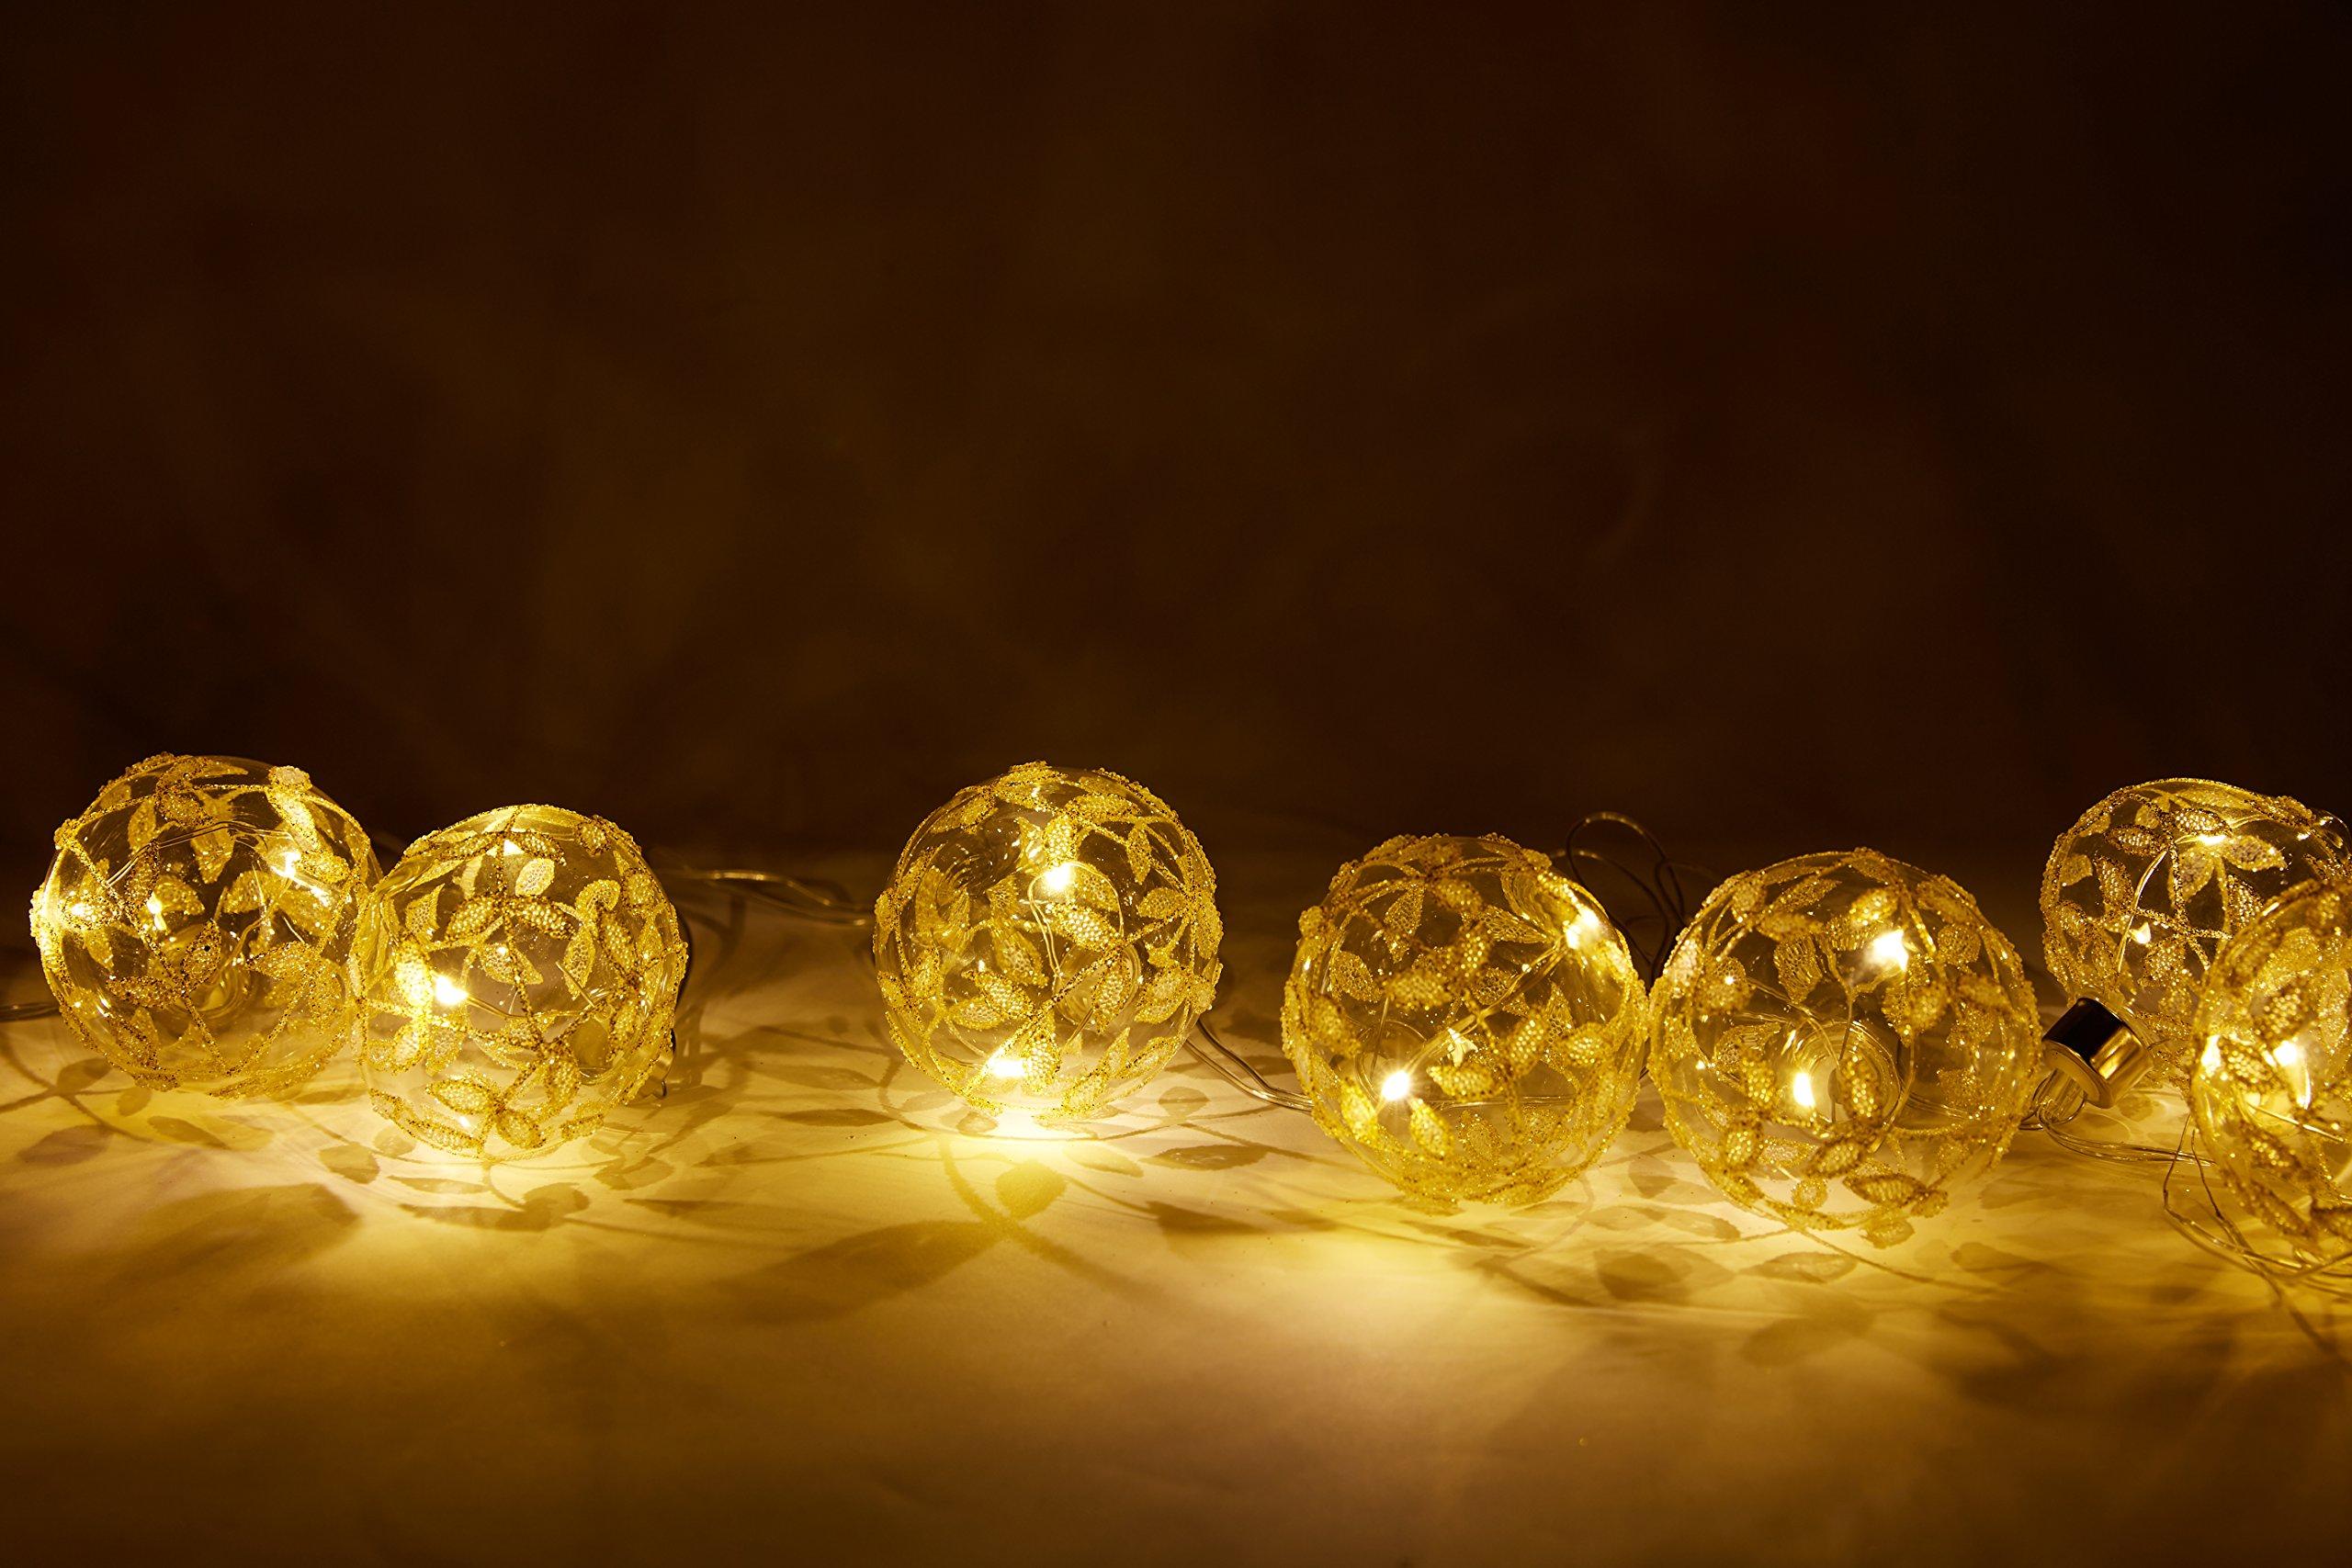 8.1Ft String Lights 10 Extra Large Glass Balls 10 LEDs, Window Decoration Summer Party Decor